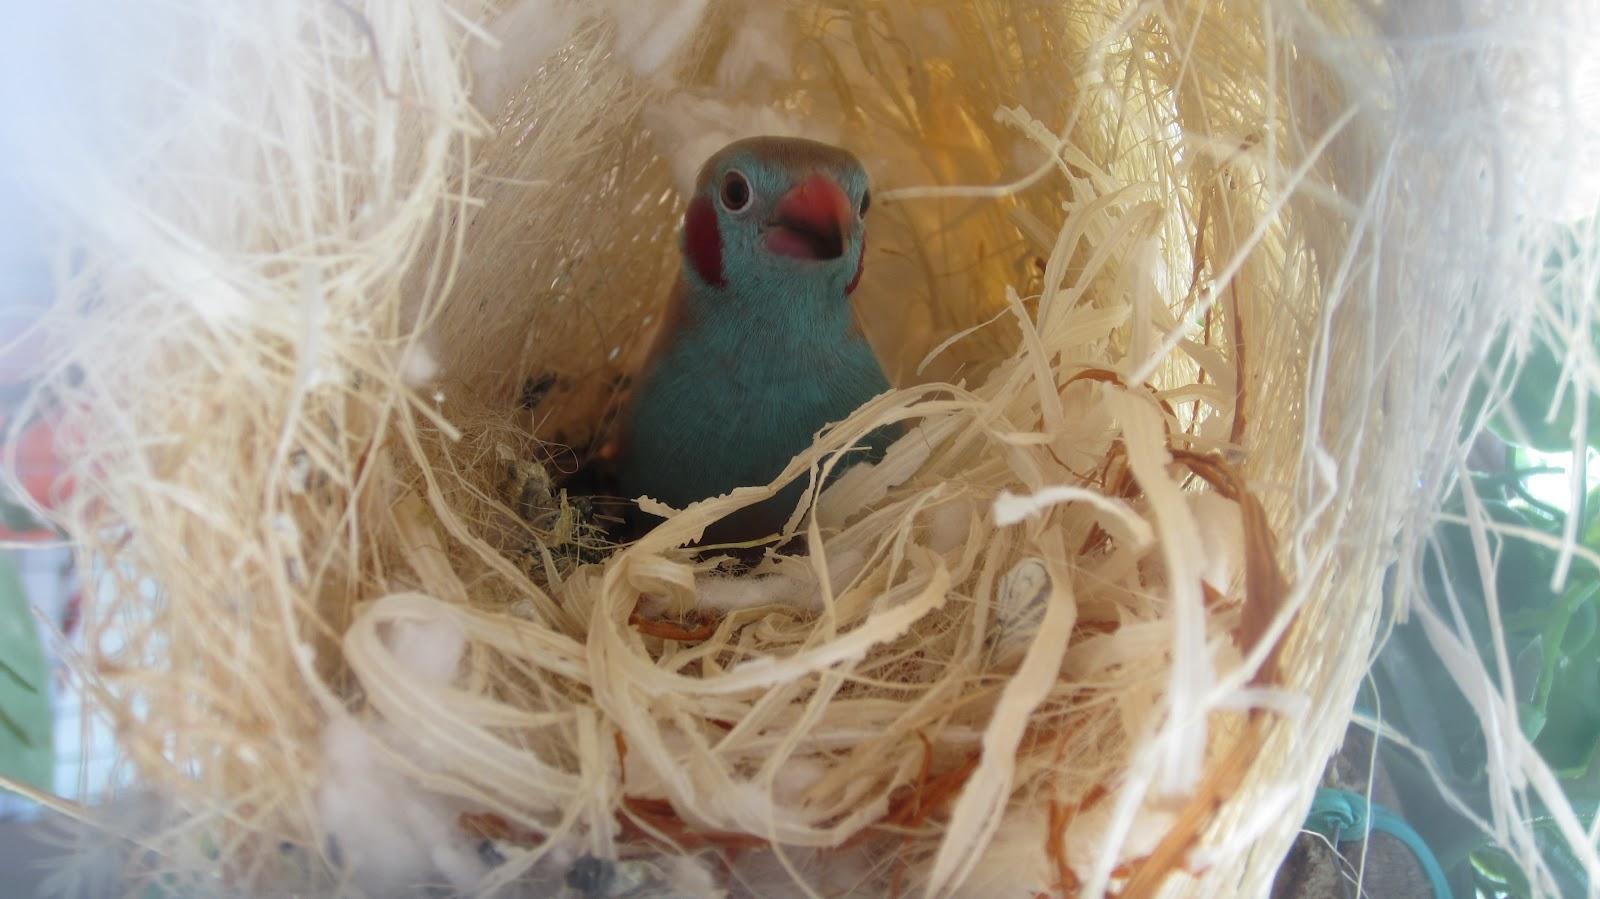 Cordon bleu finch nest - photo#22